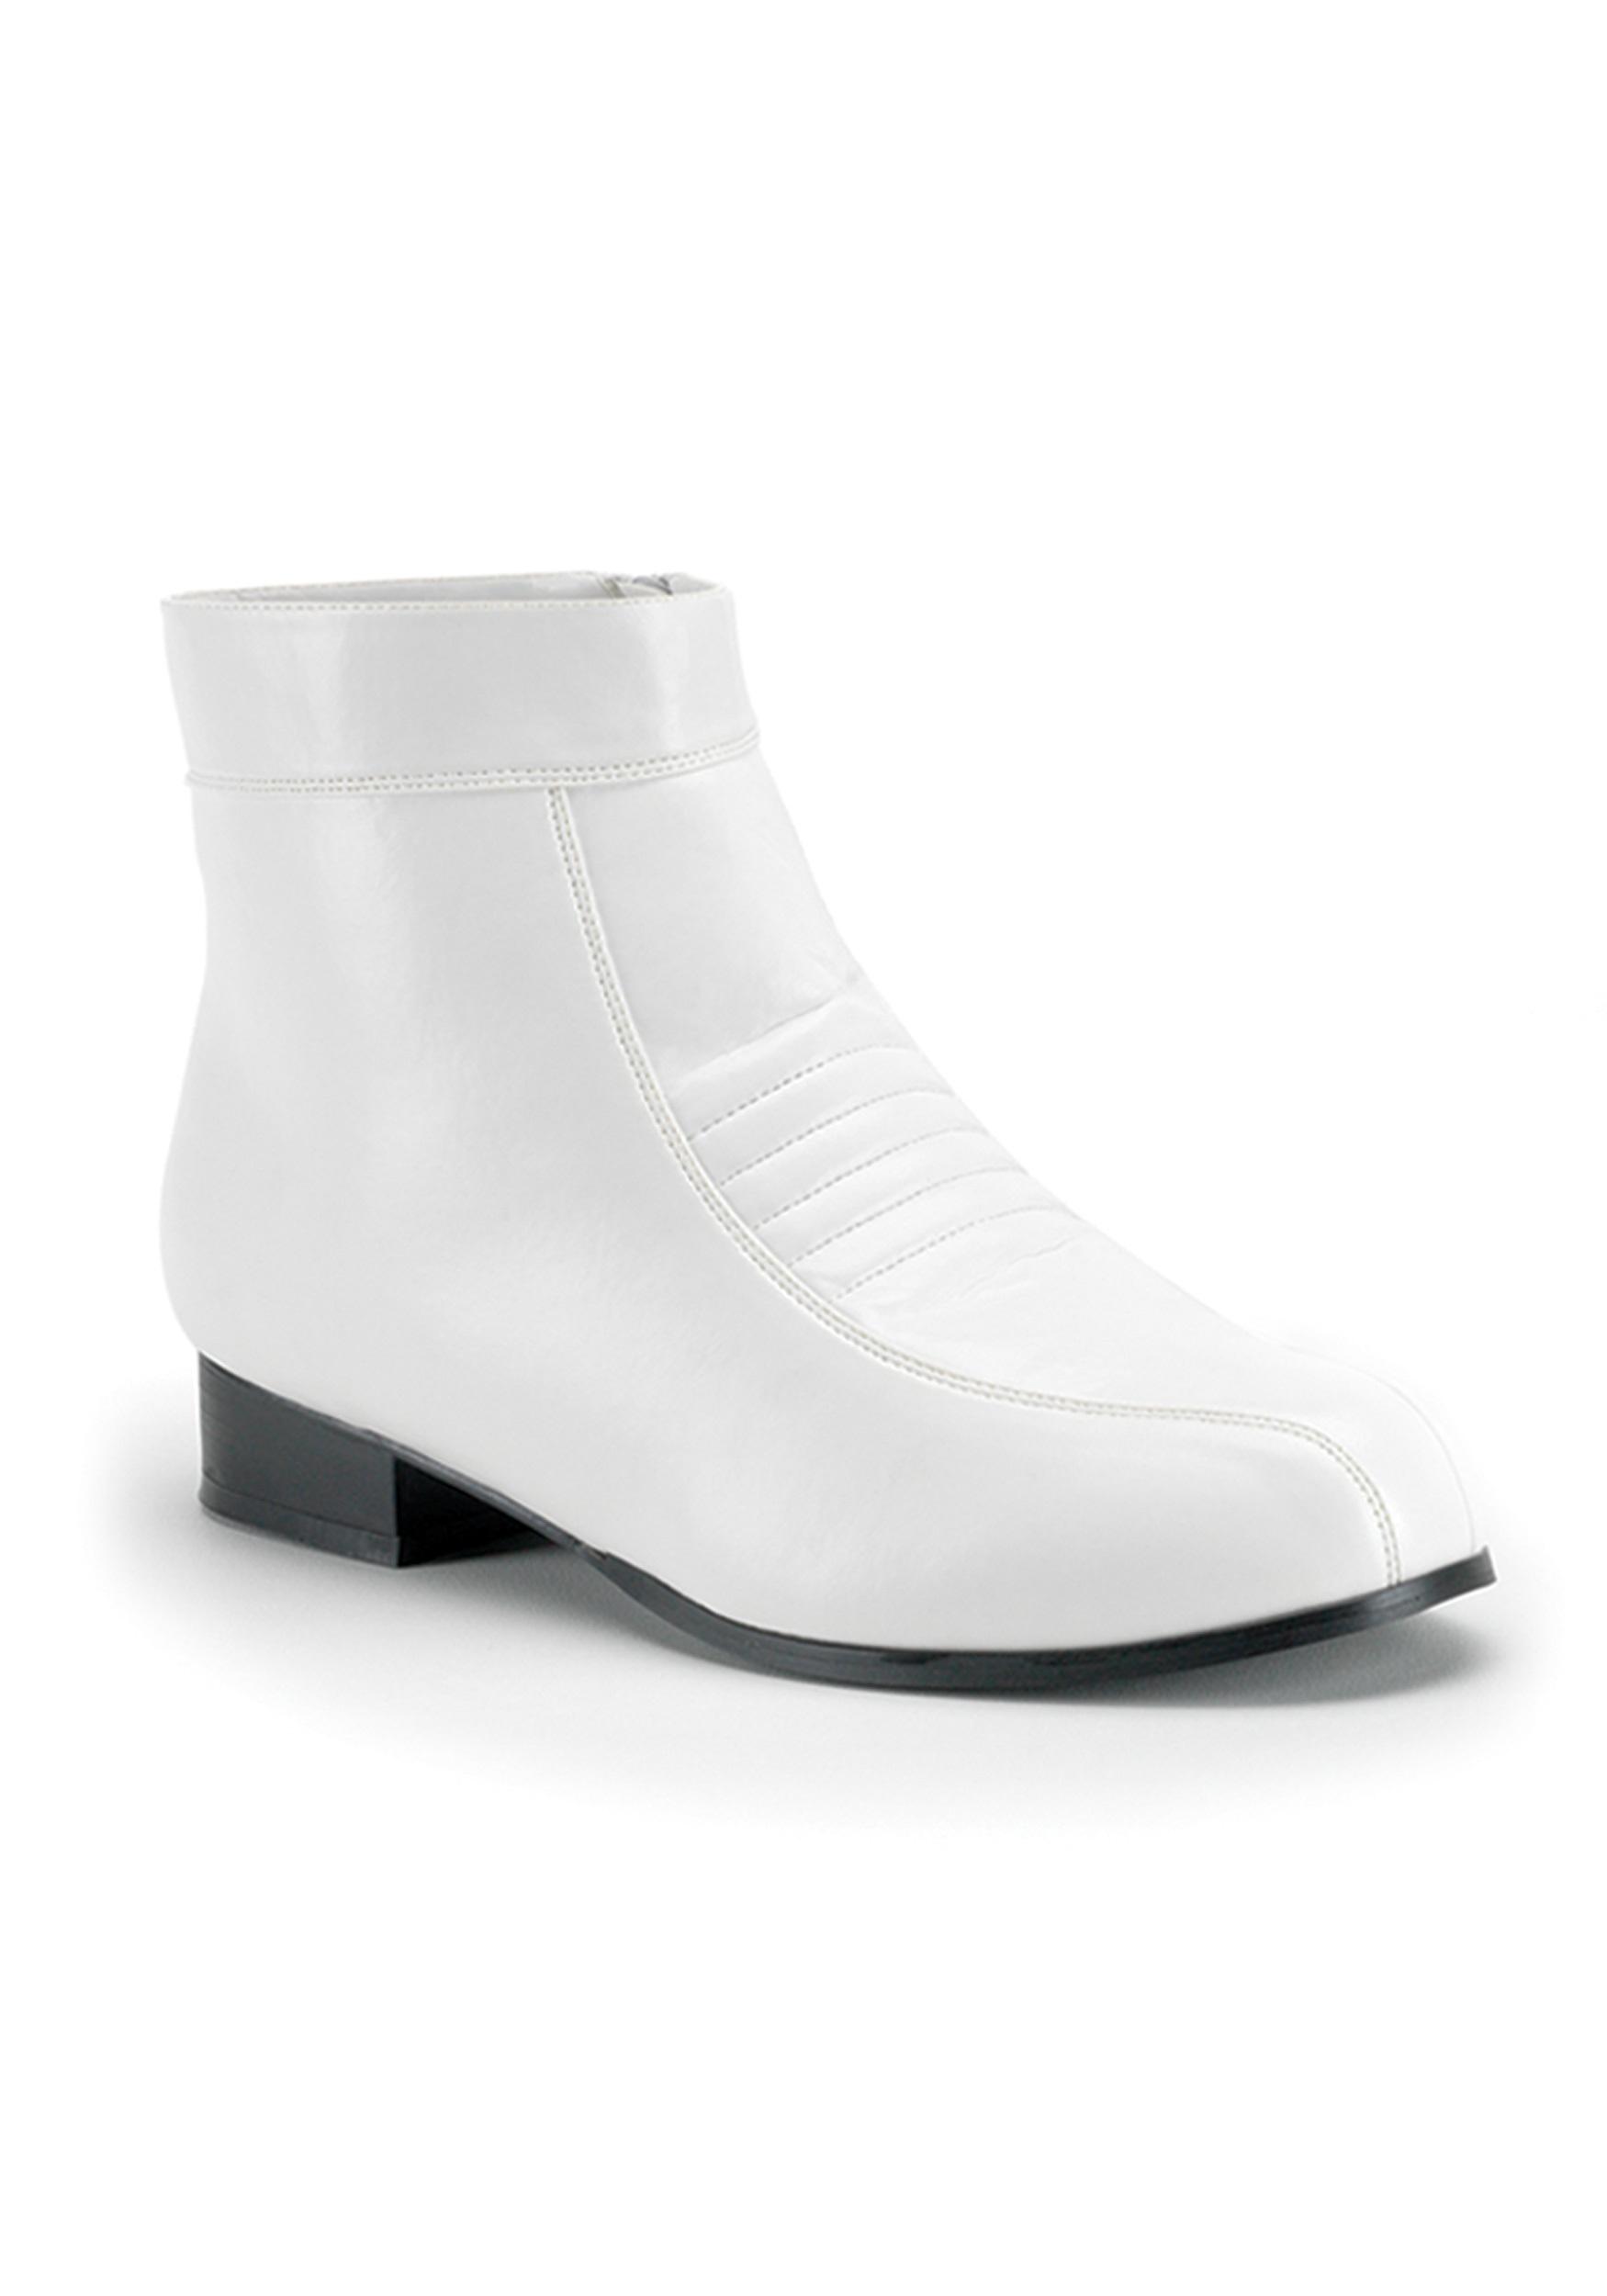 River Island Mens Quality Formal Shoe Sale